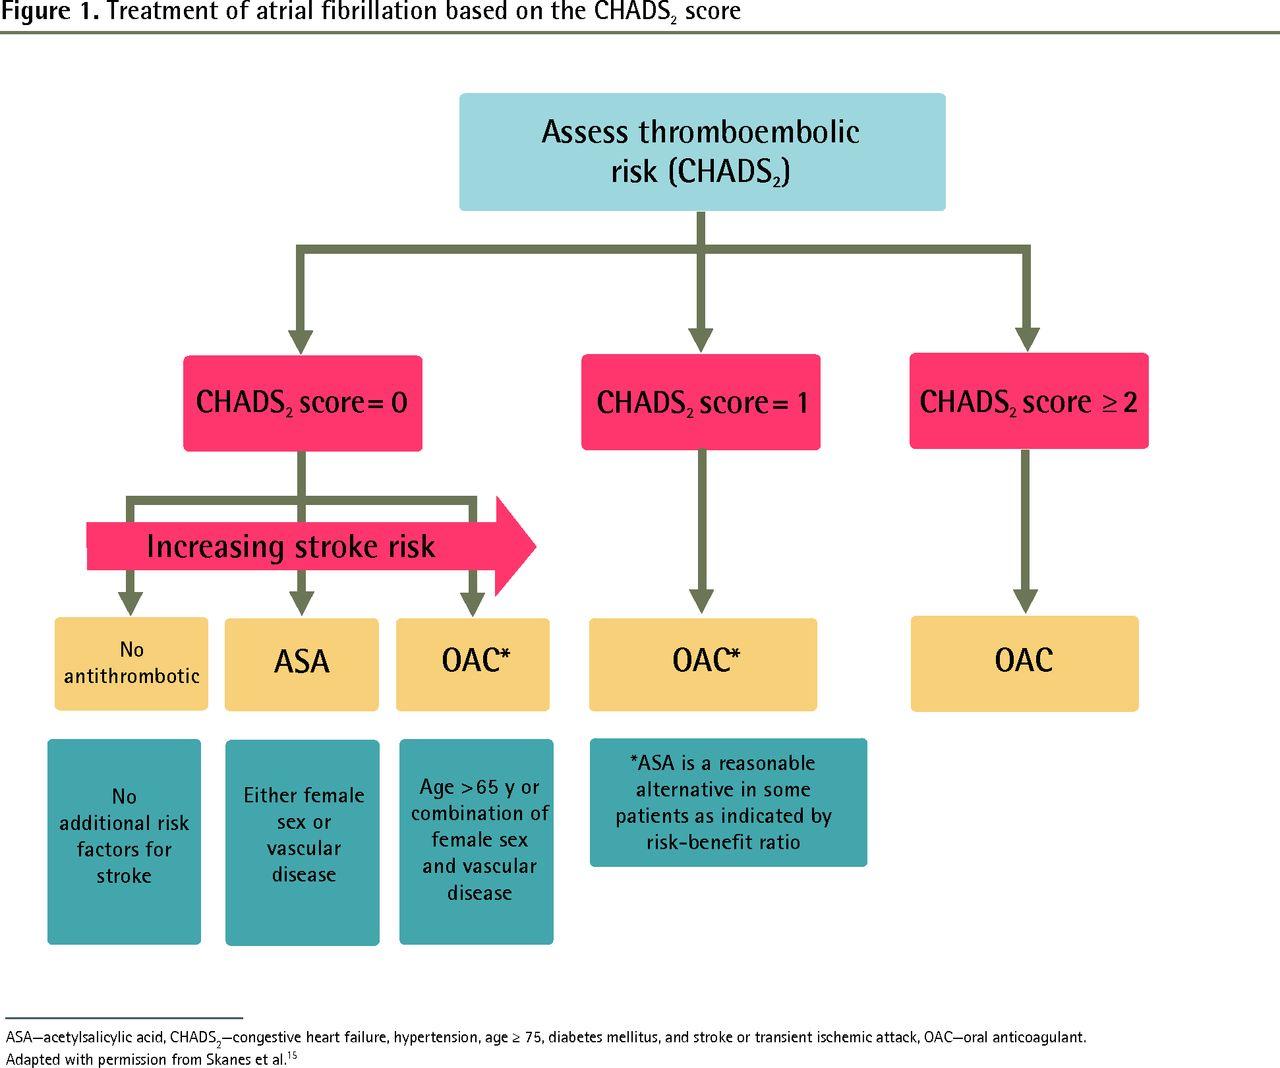 Atrial fibrillation anticoagulation care in a large urban